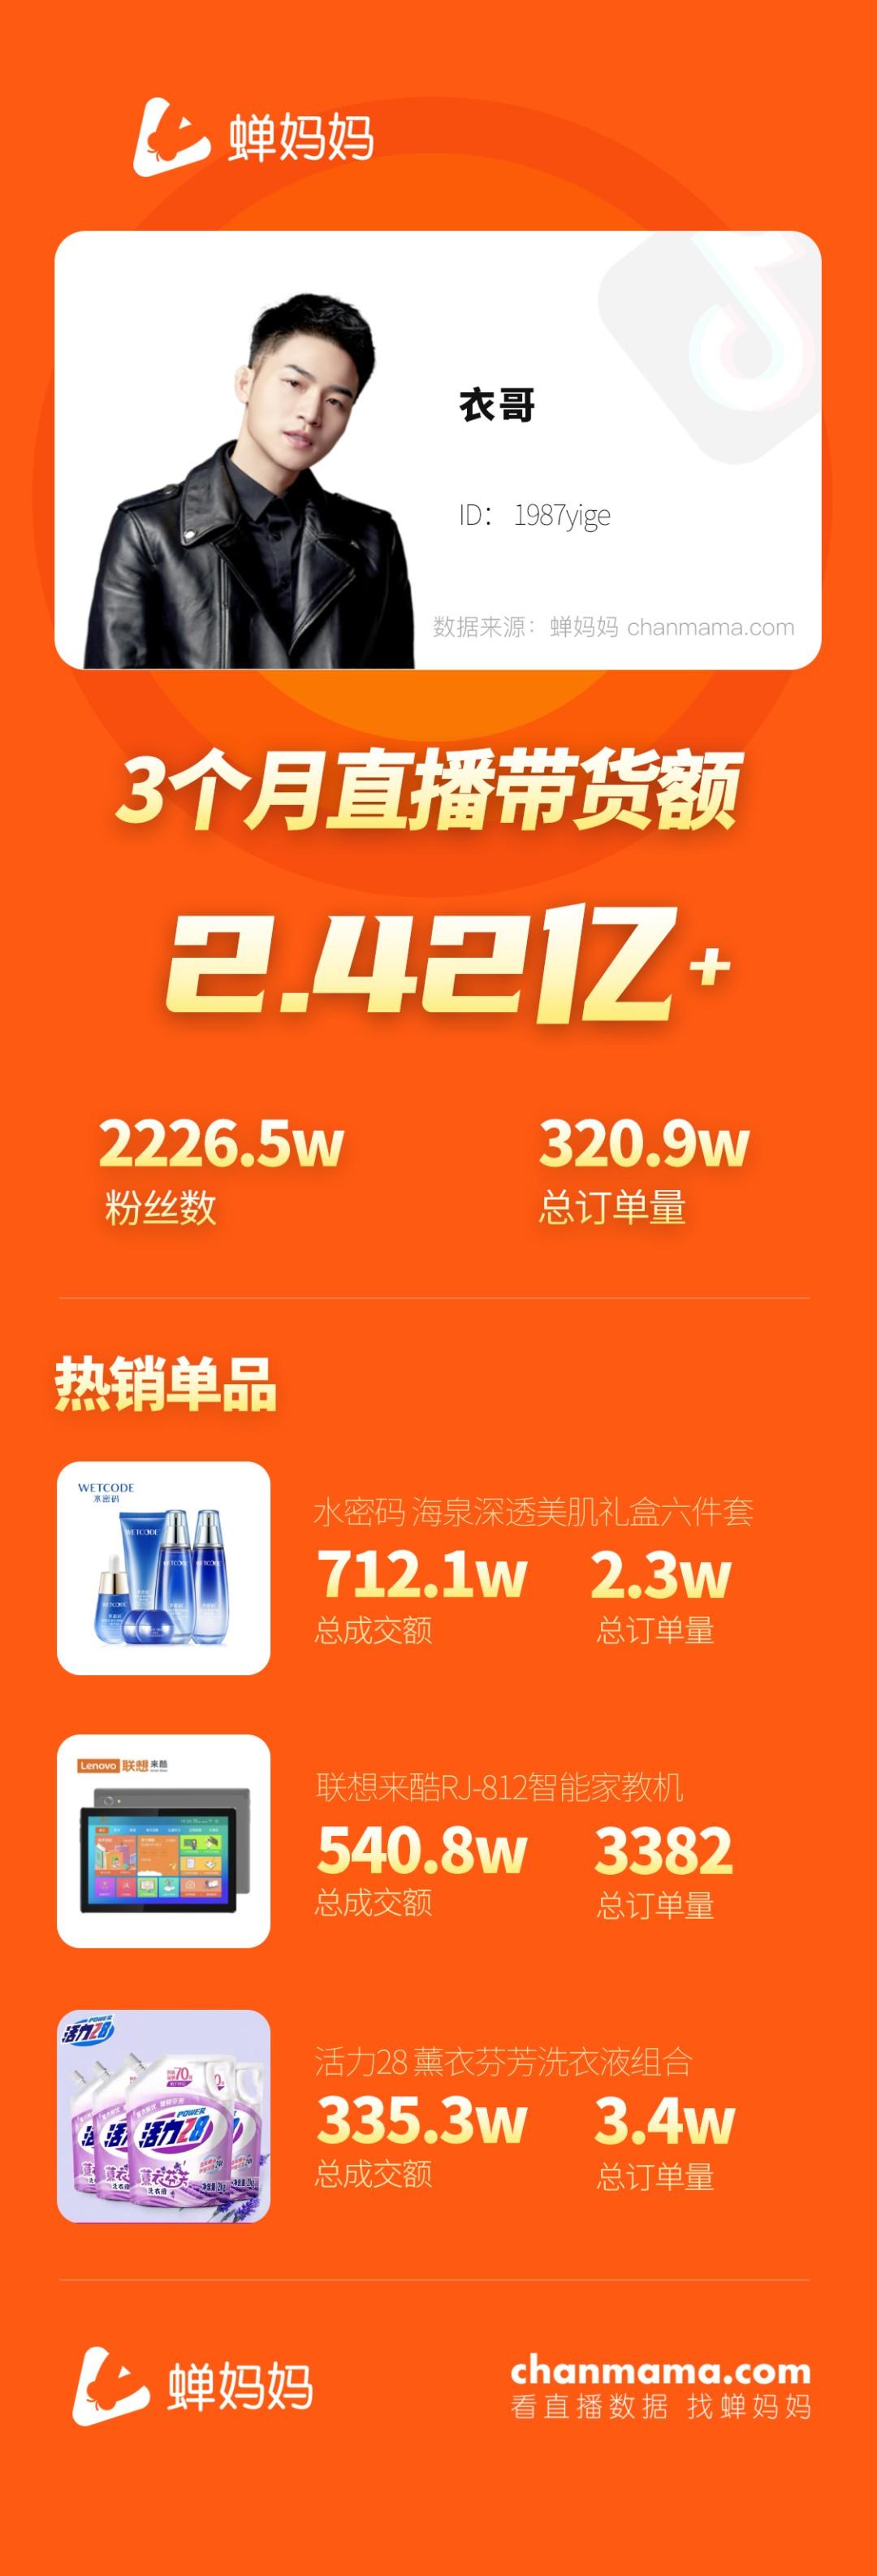 attachments-2021-09-usvC17lZ6135792953e8a.png